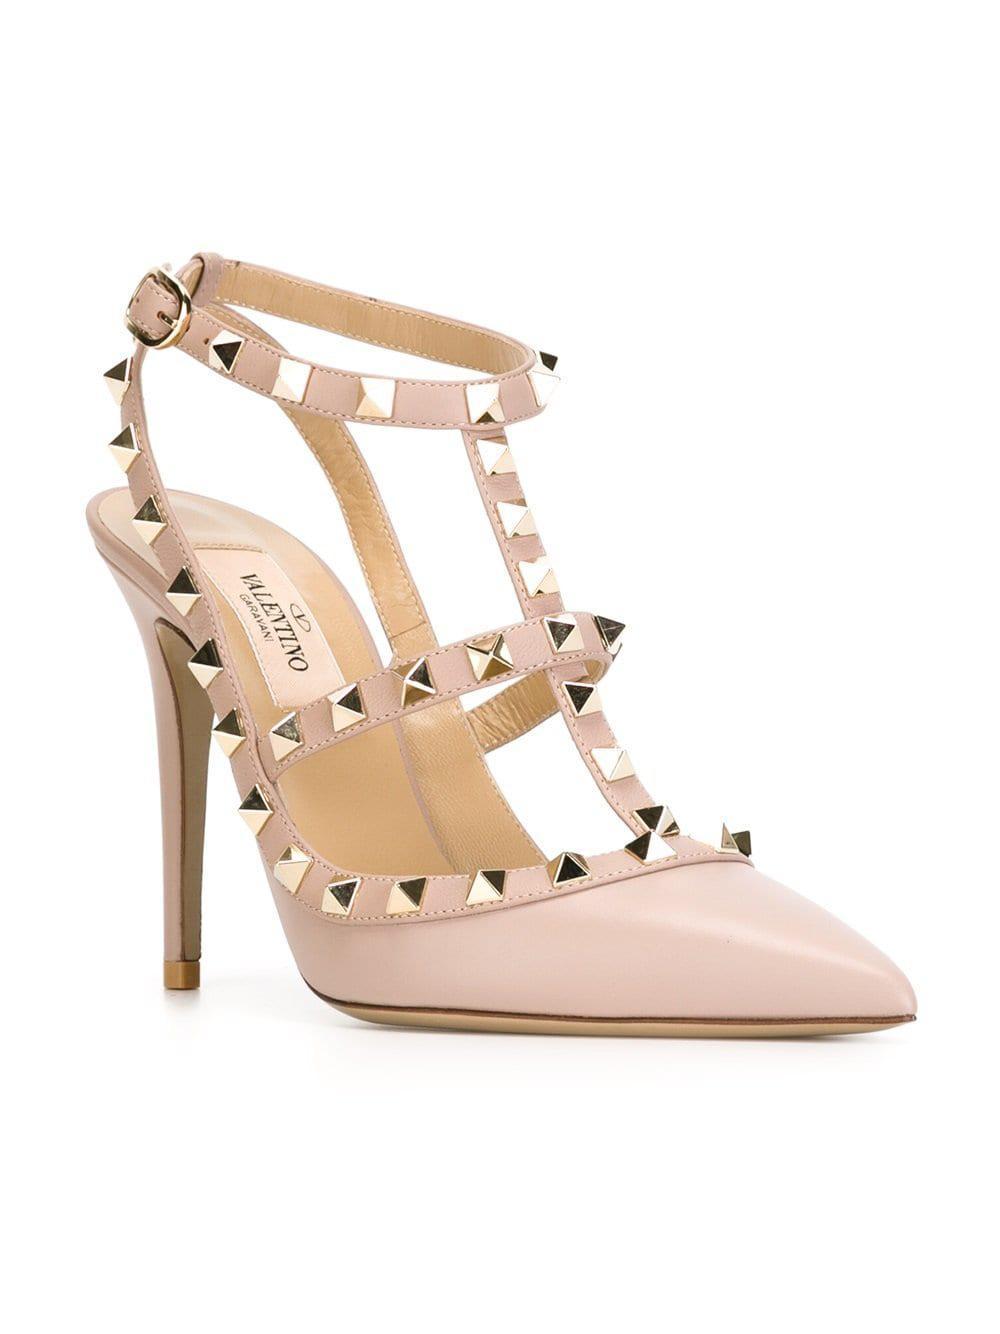 d18bbcba38e2 Lyst - Valentino Garavani Rockstud Pumps in Pink